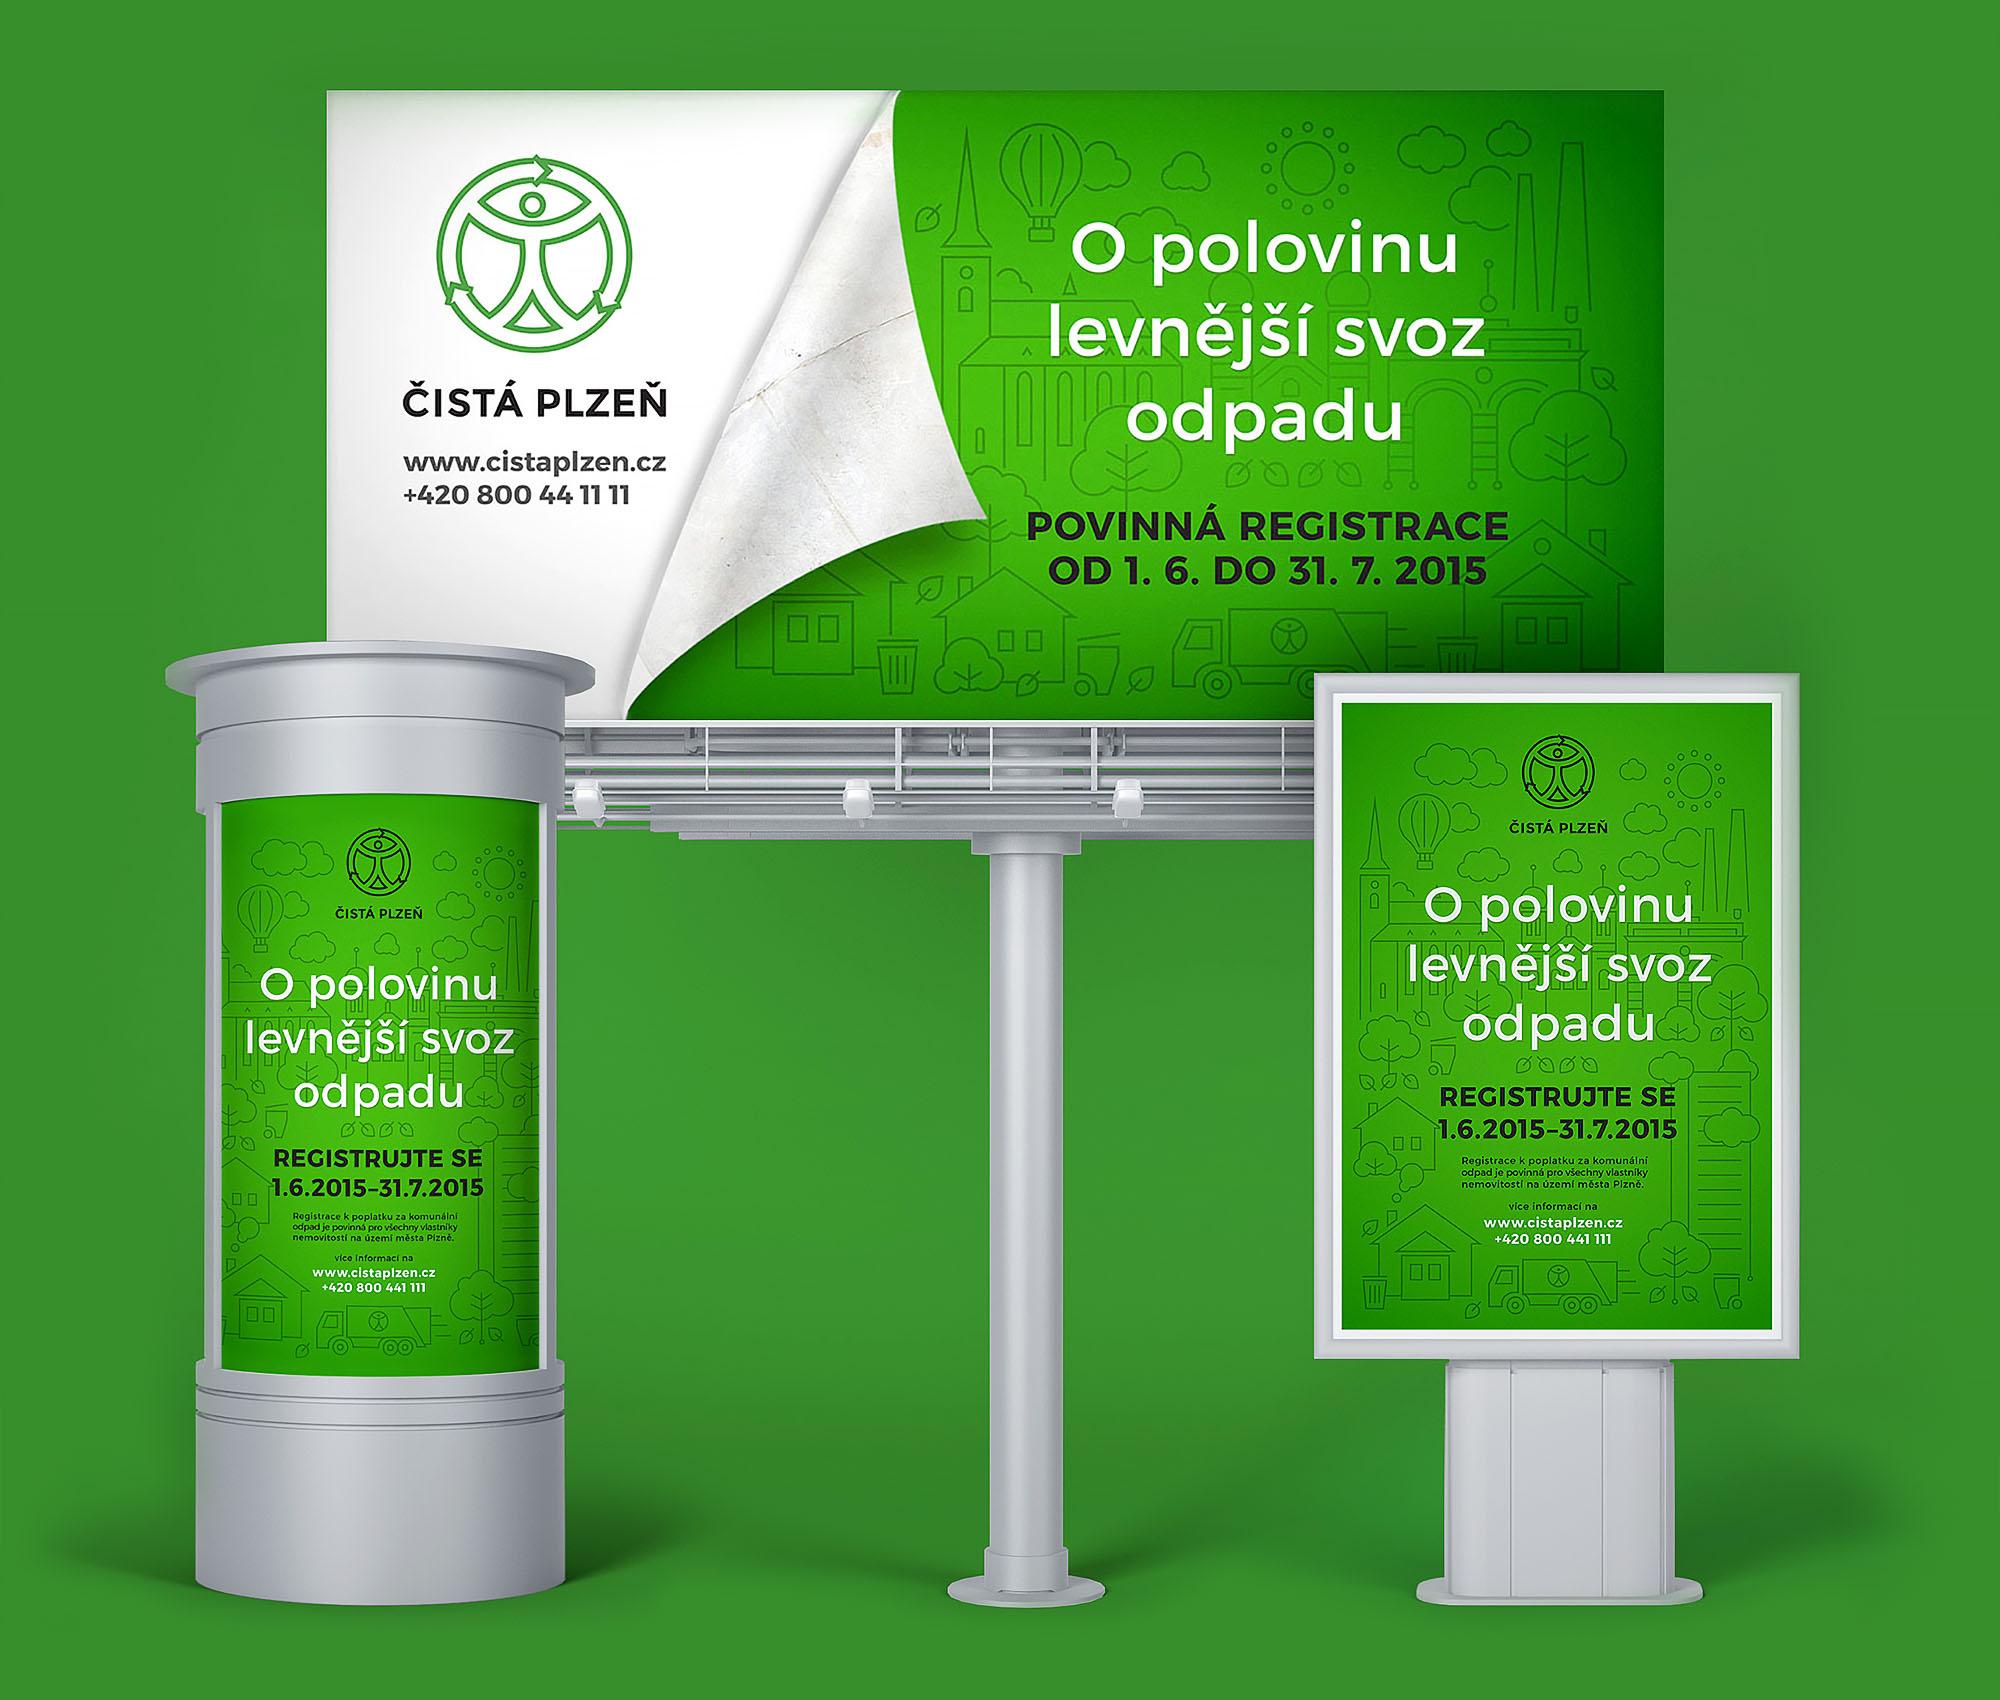 cista_plzen_kompozice_kampan